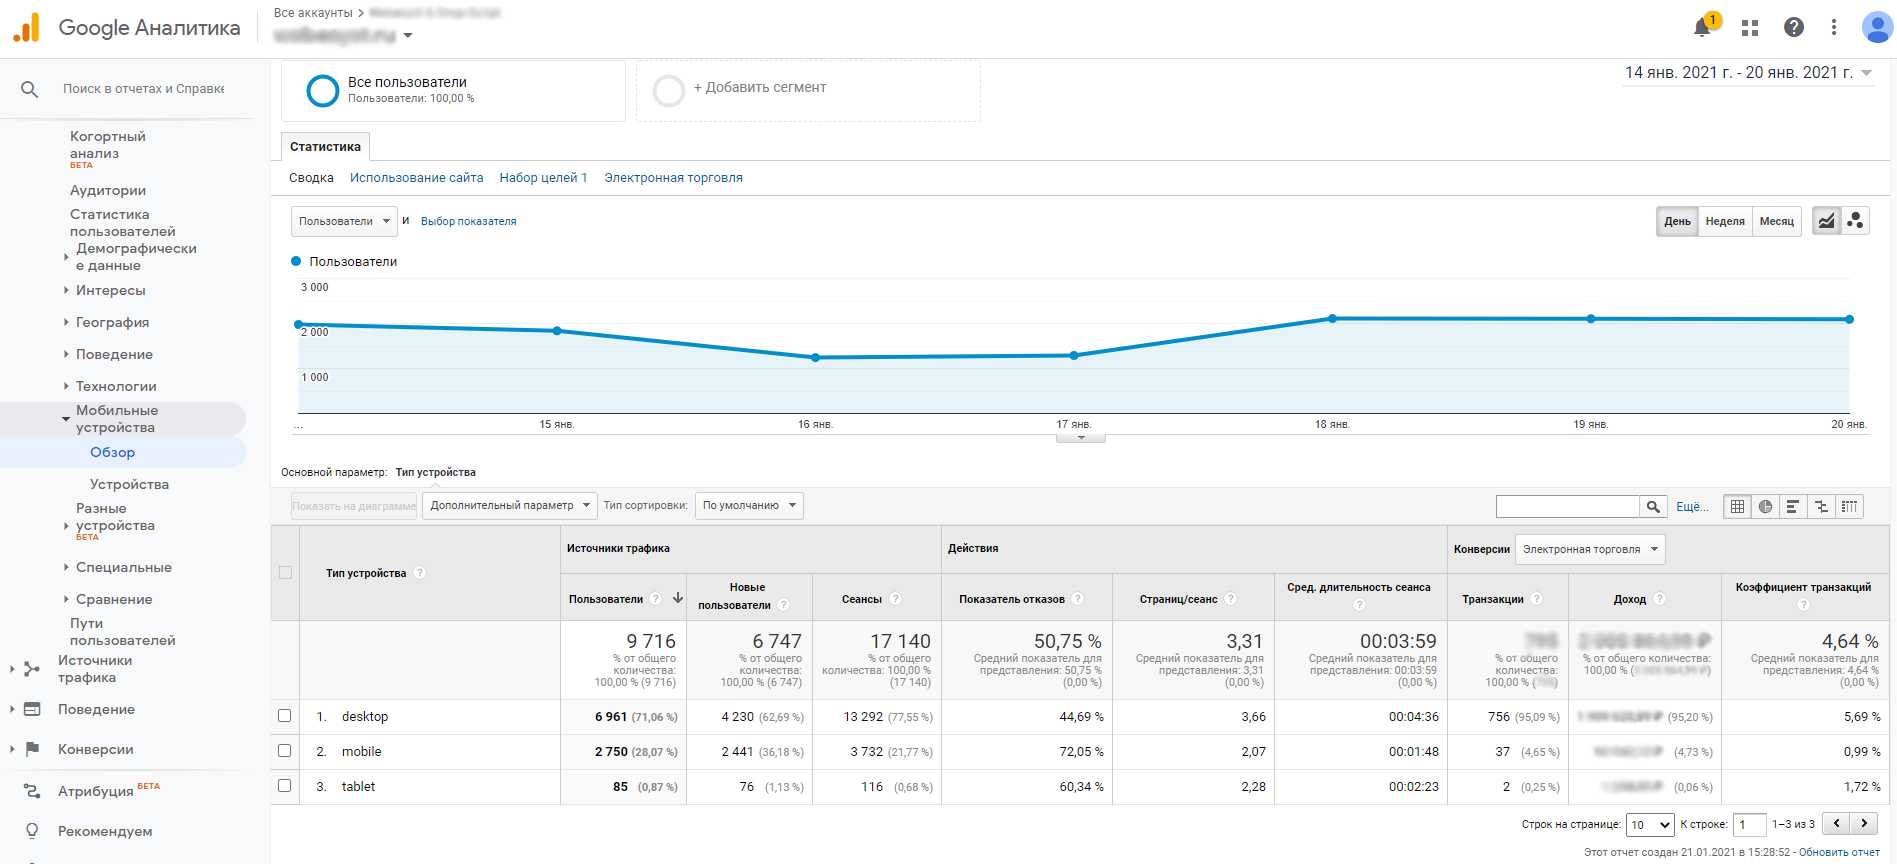 Отчет по устройствам Гугл Аналитика